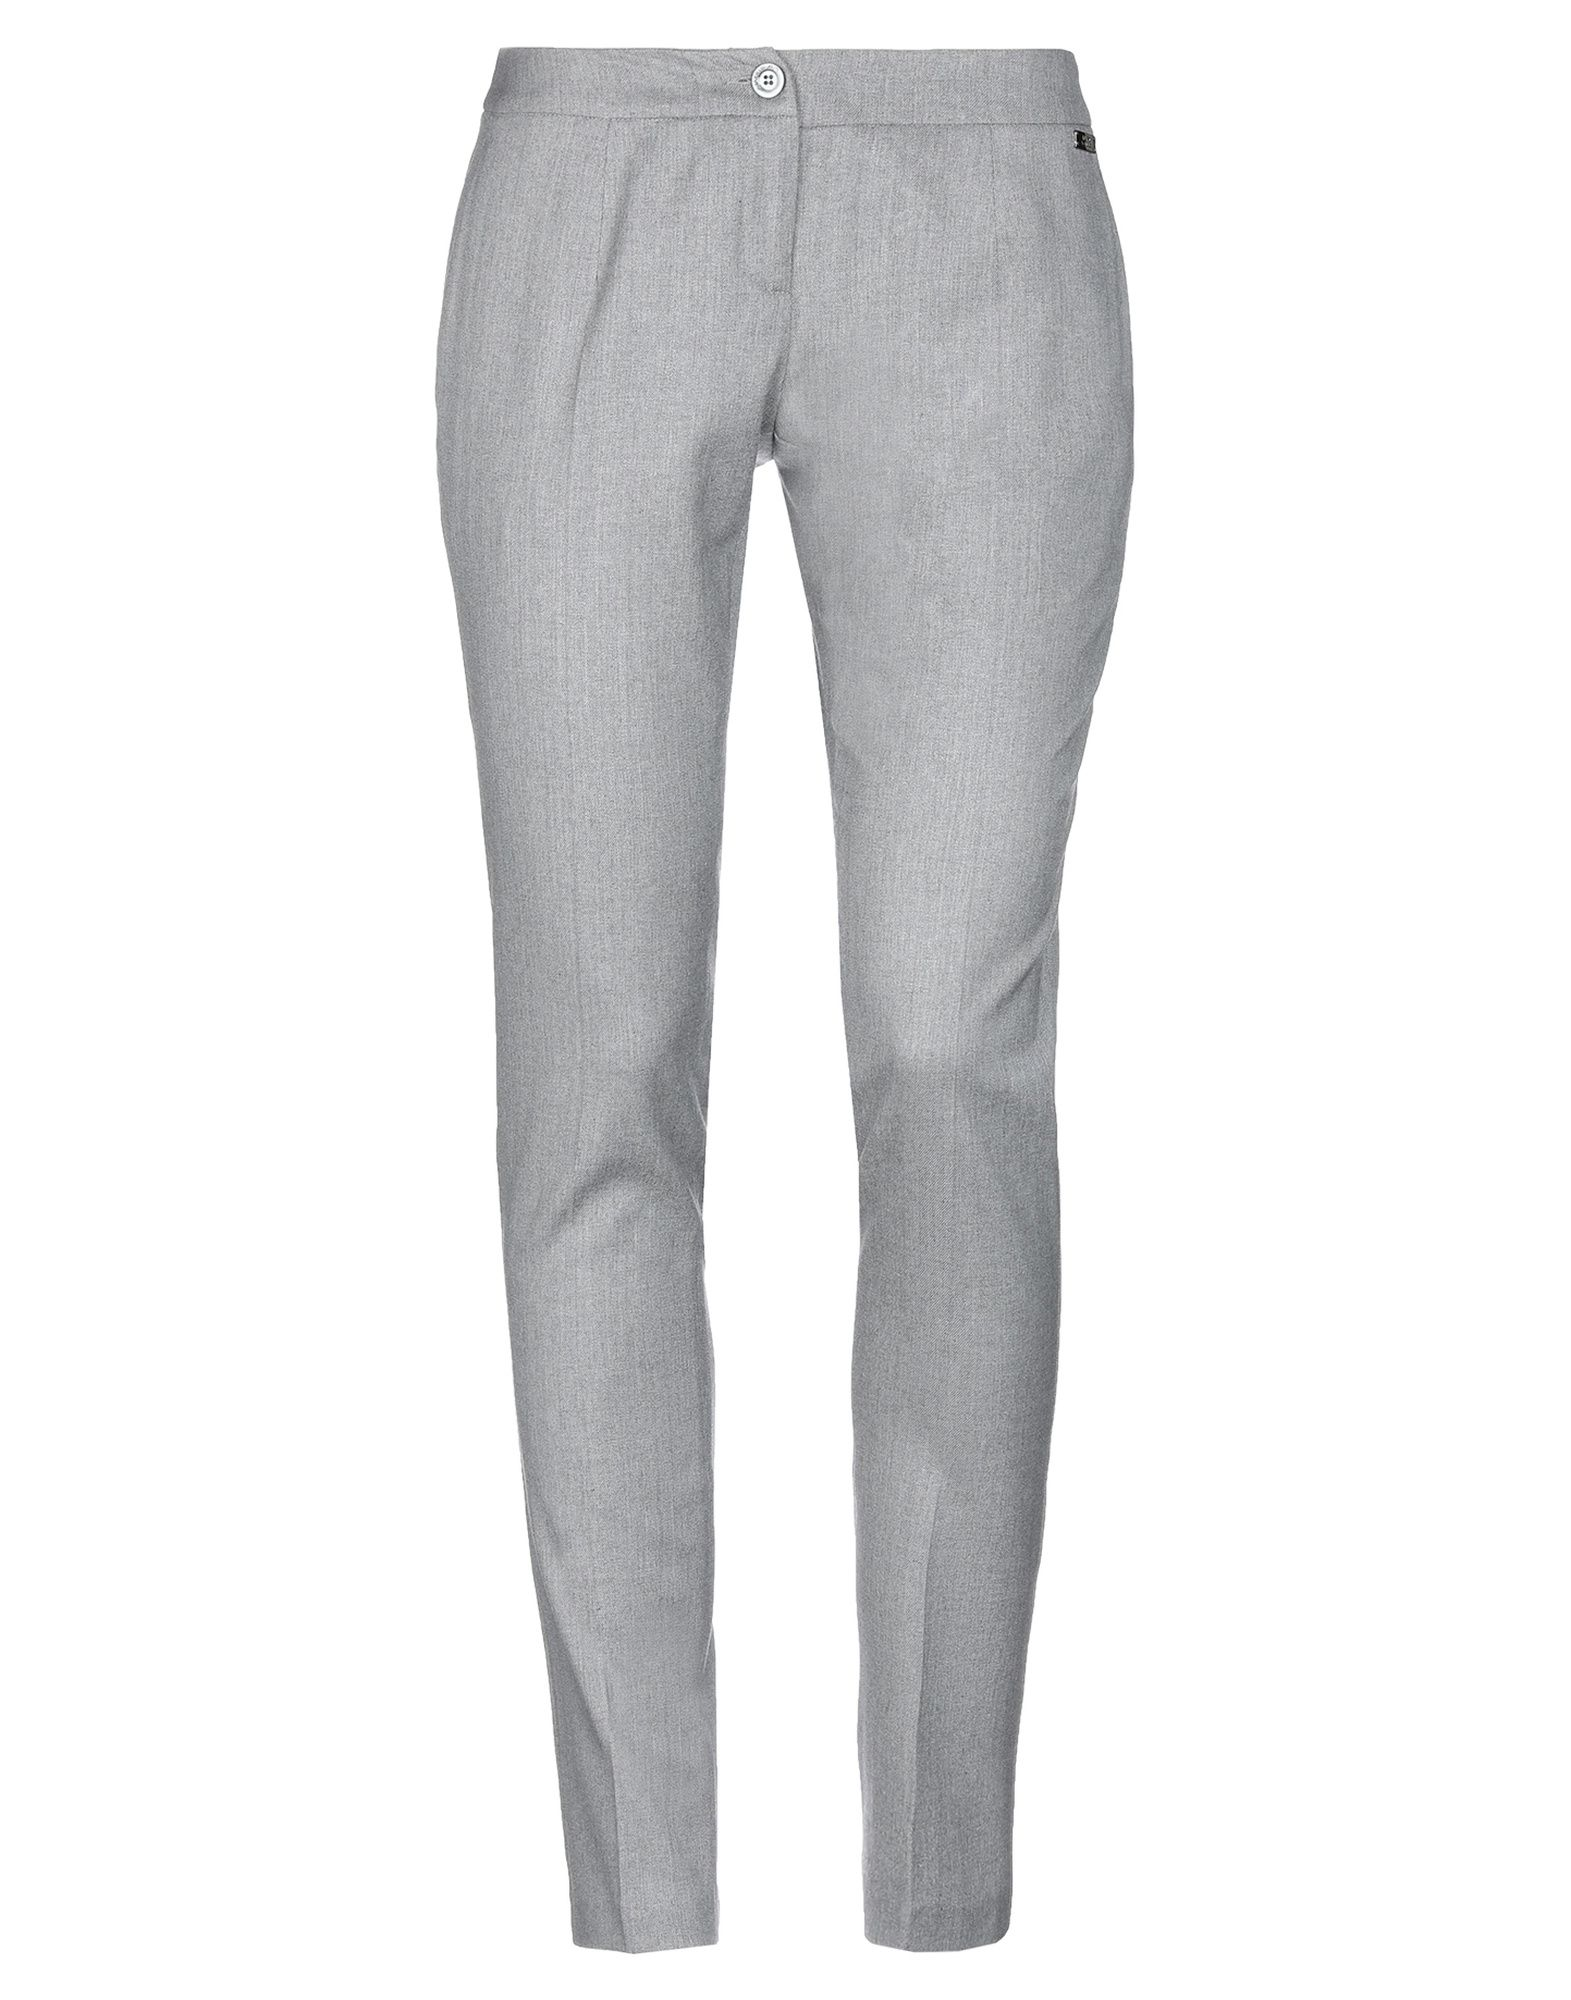 AJAY by LIU •JO Повседневные брюки ajay by liu •jo повседневные брюки